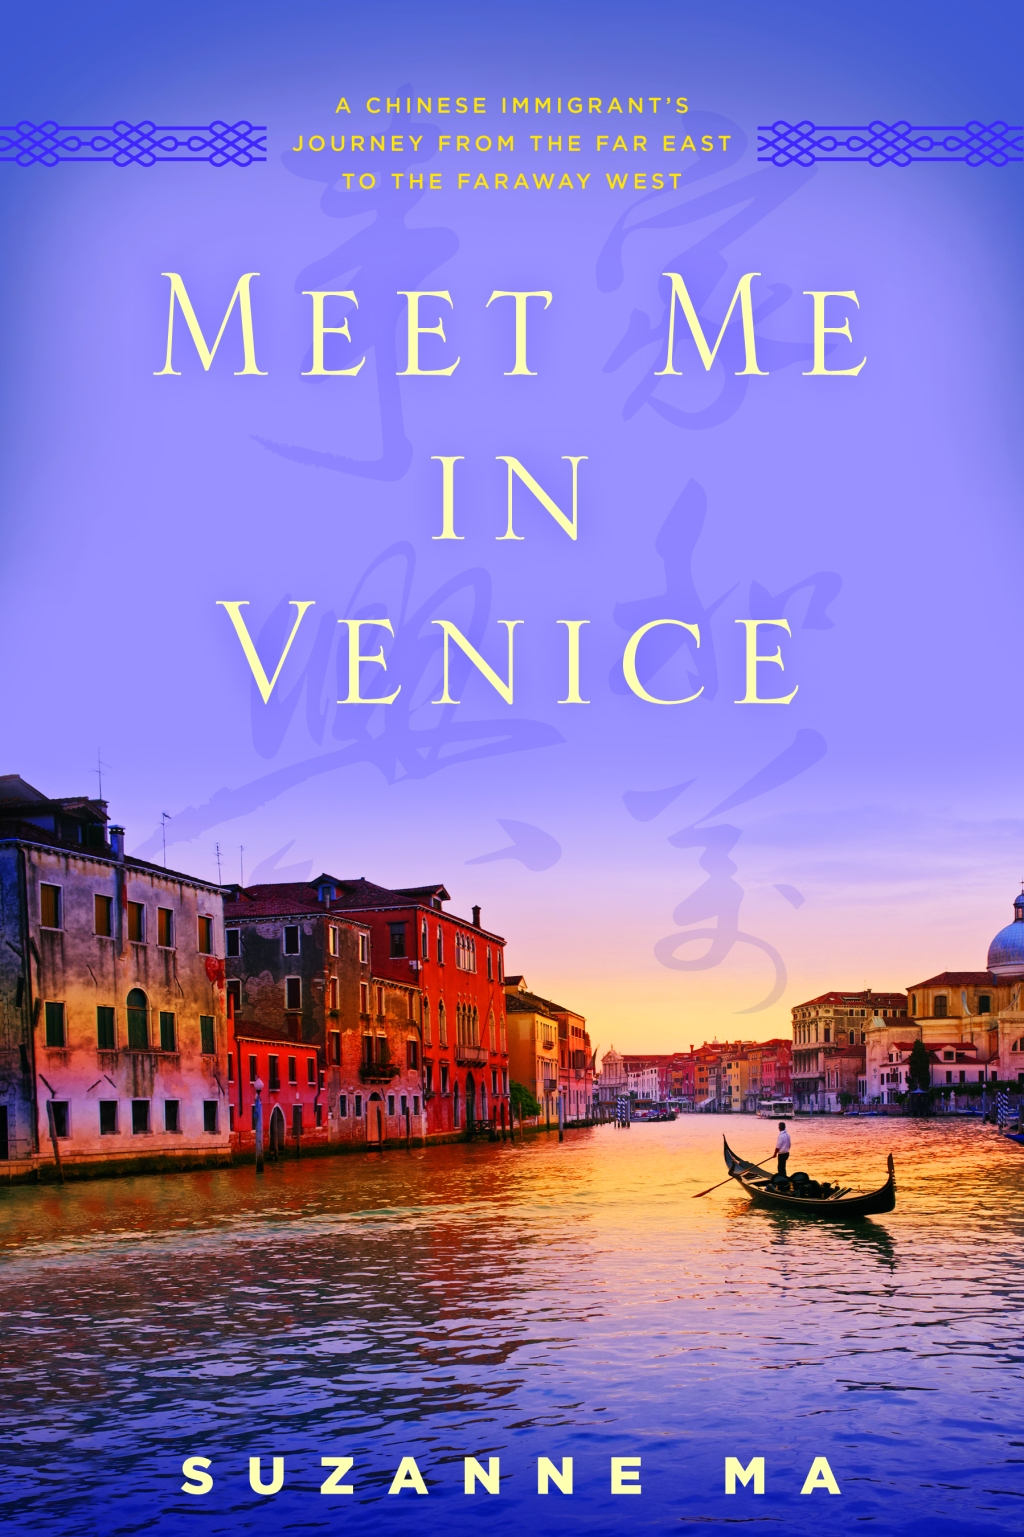 meet me in venice book suzanne ma